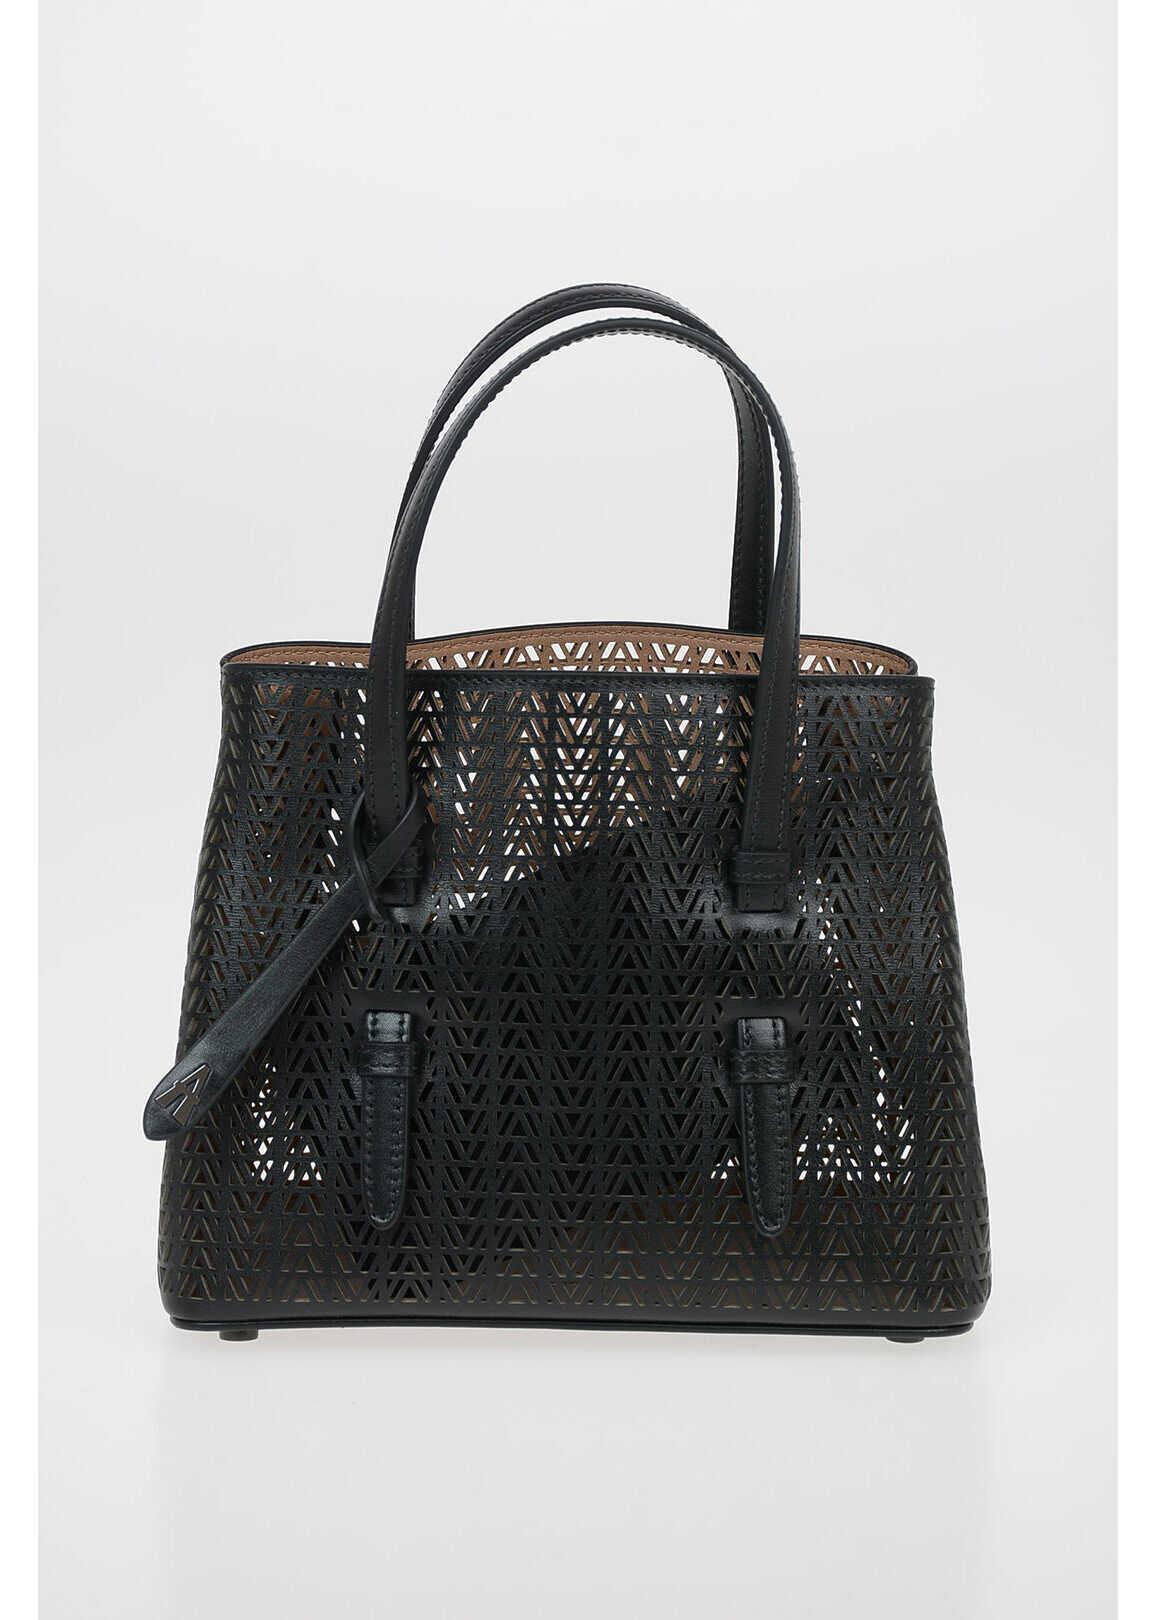 Alaïa Laser Cut Leather MINA MINI Tote Bag with Removable Shoulder BLACK imagine b-mall.ro